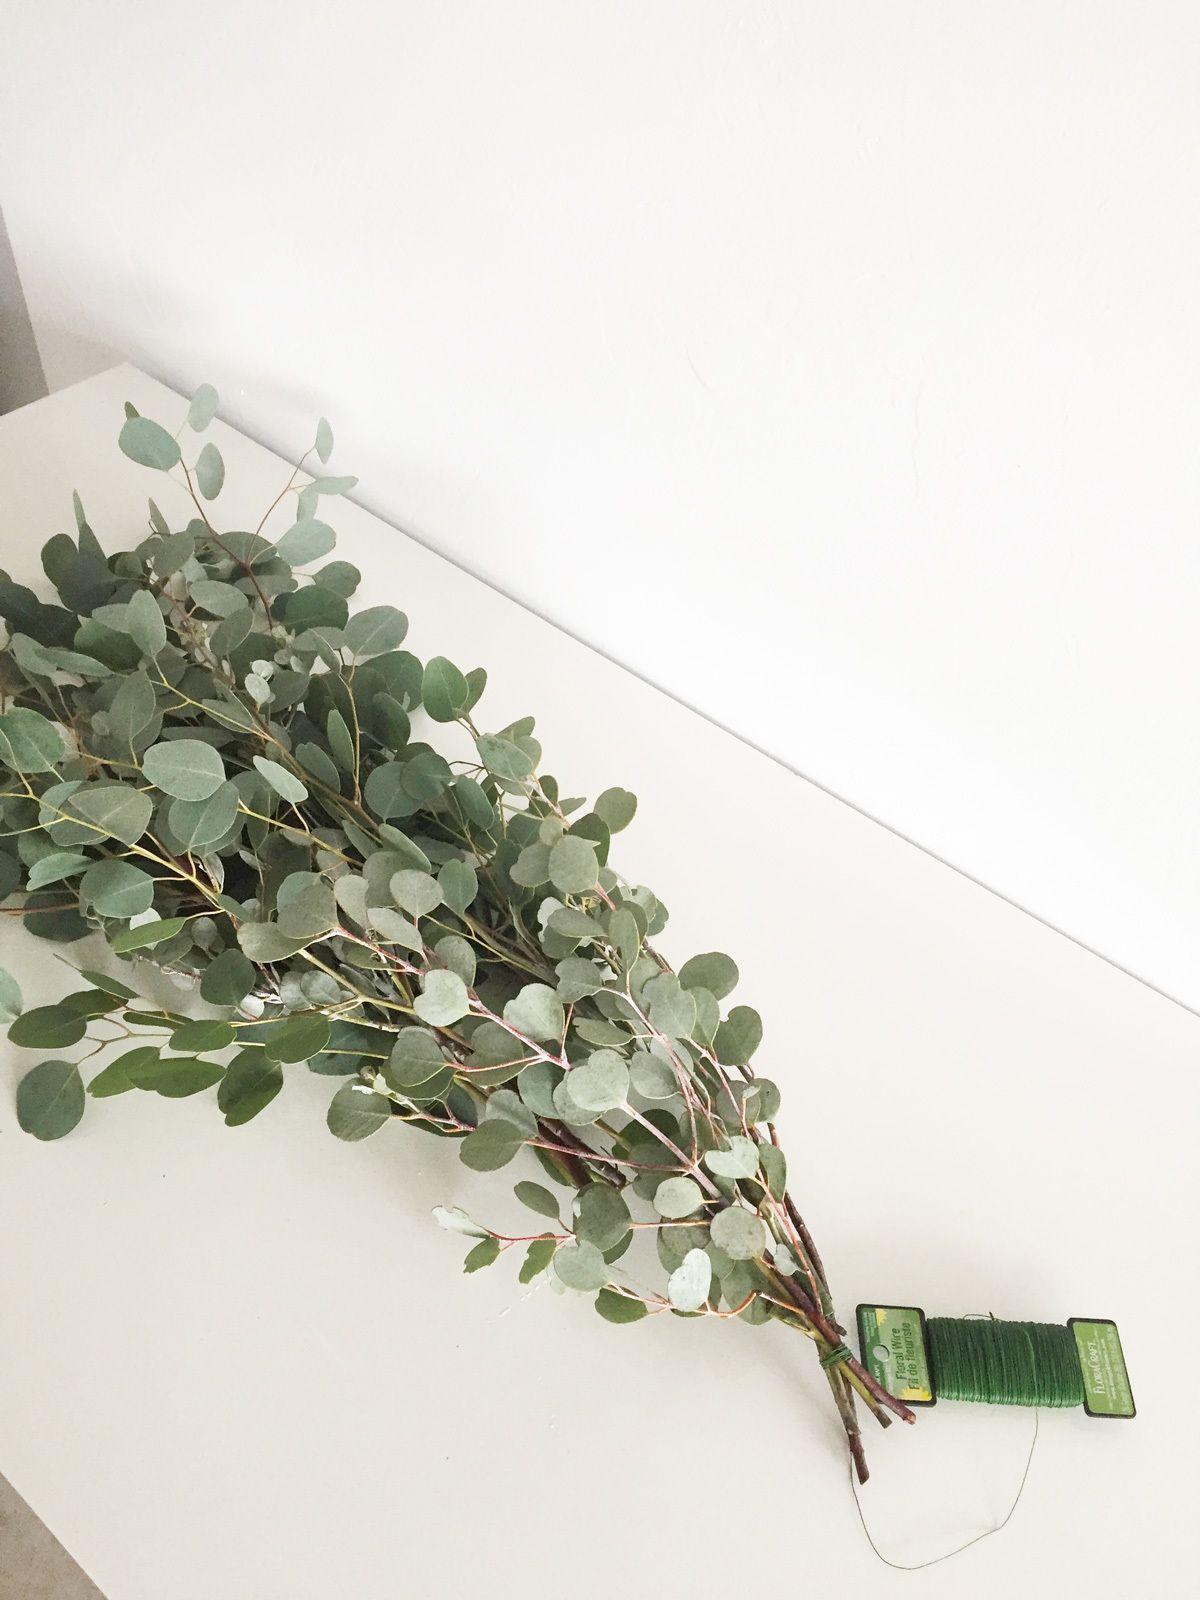 Pergola Diy Eucalyptus Garland With Fl Hanging Globes